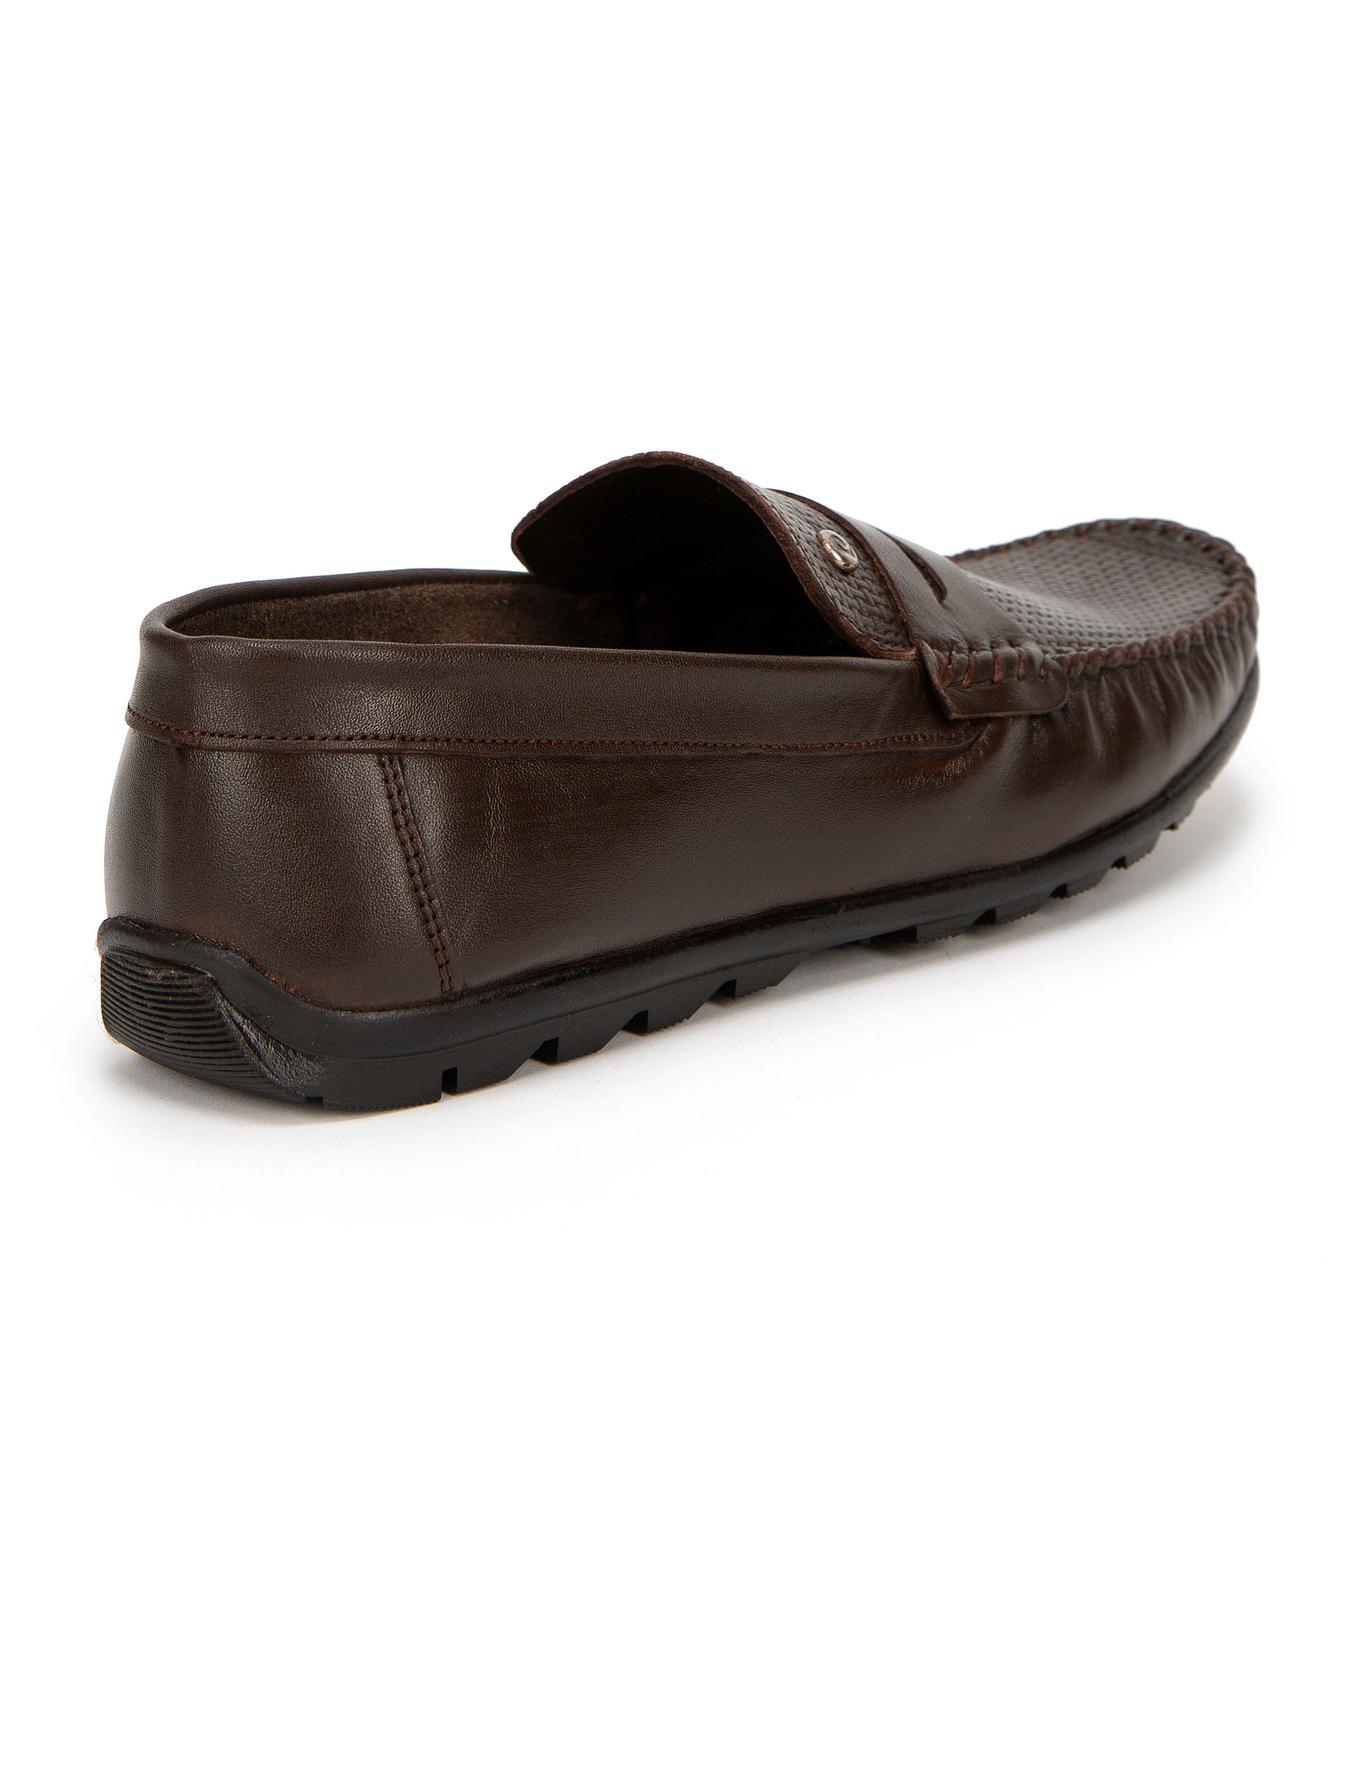 Kahverengi Loafer Ayakkabı